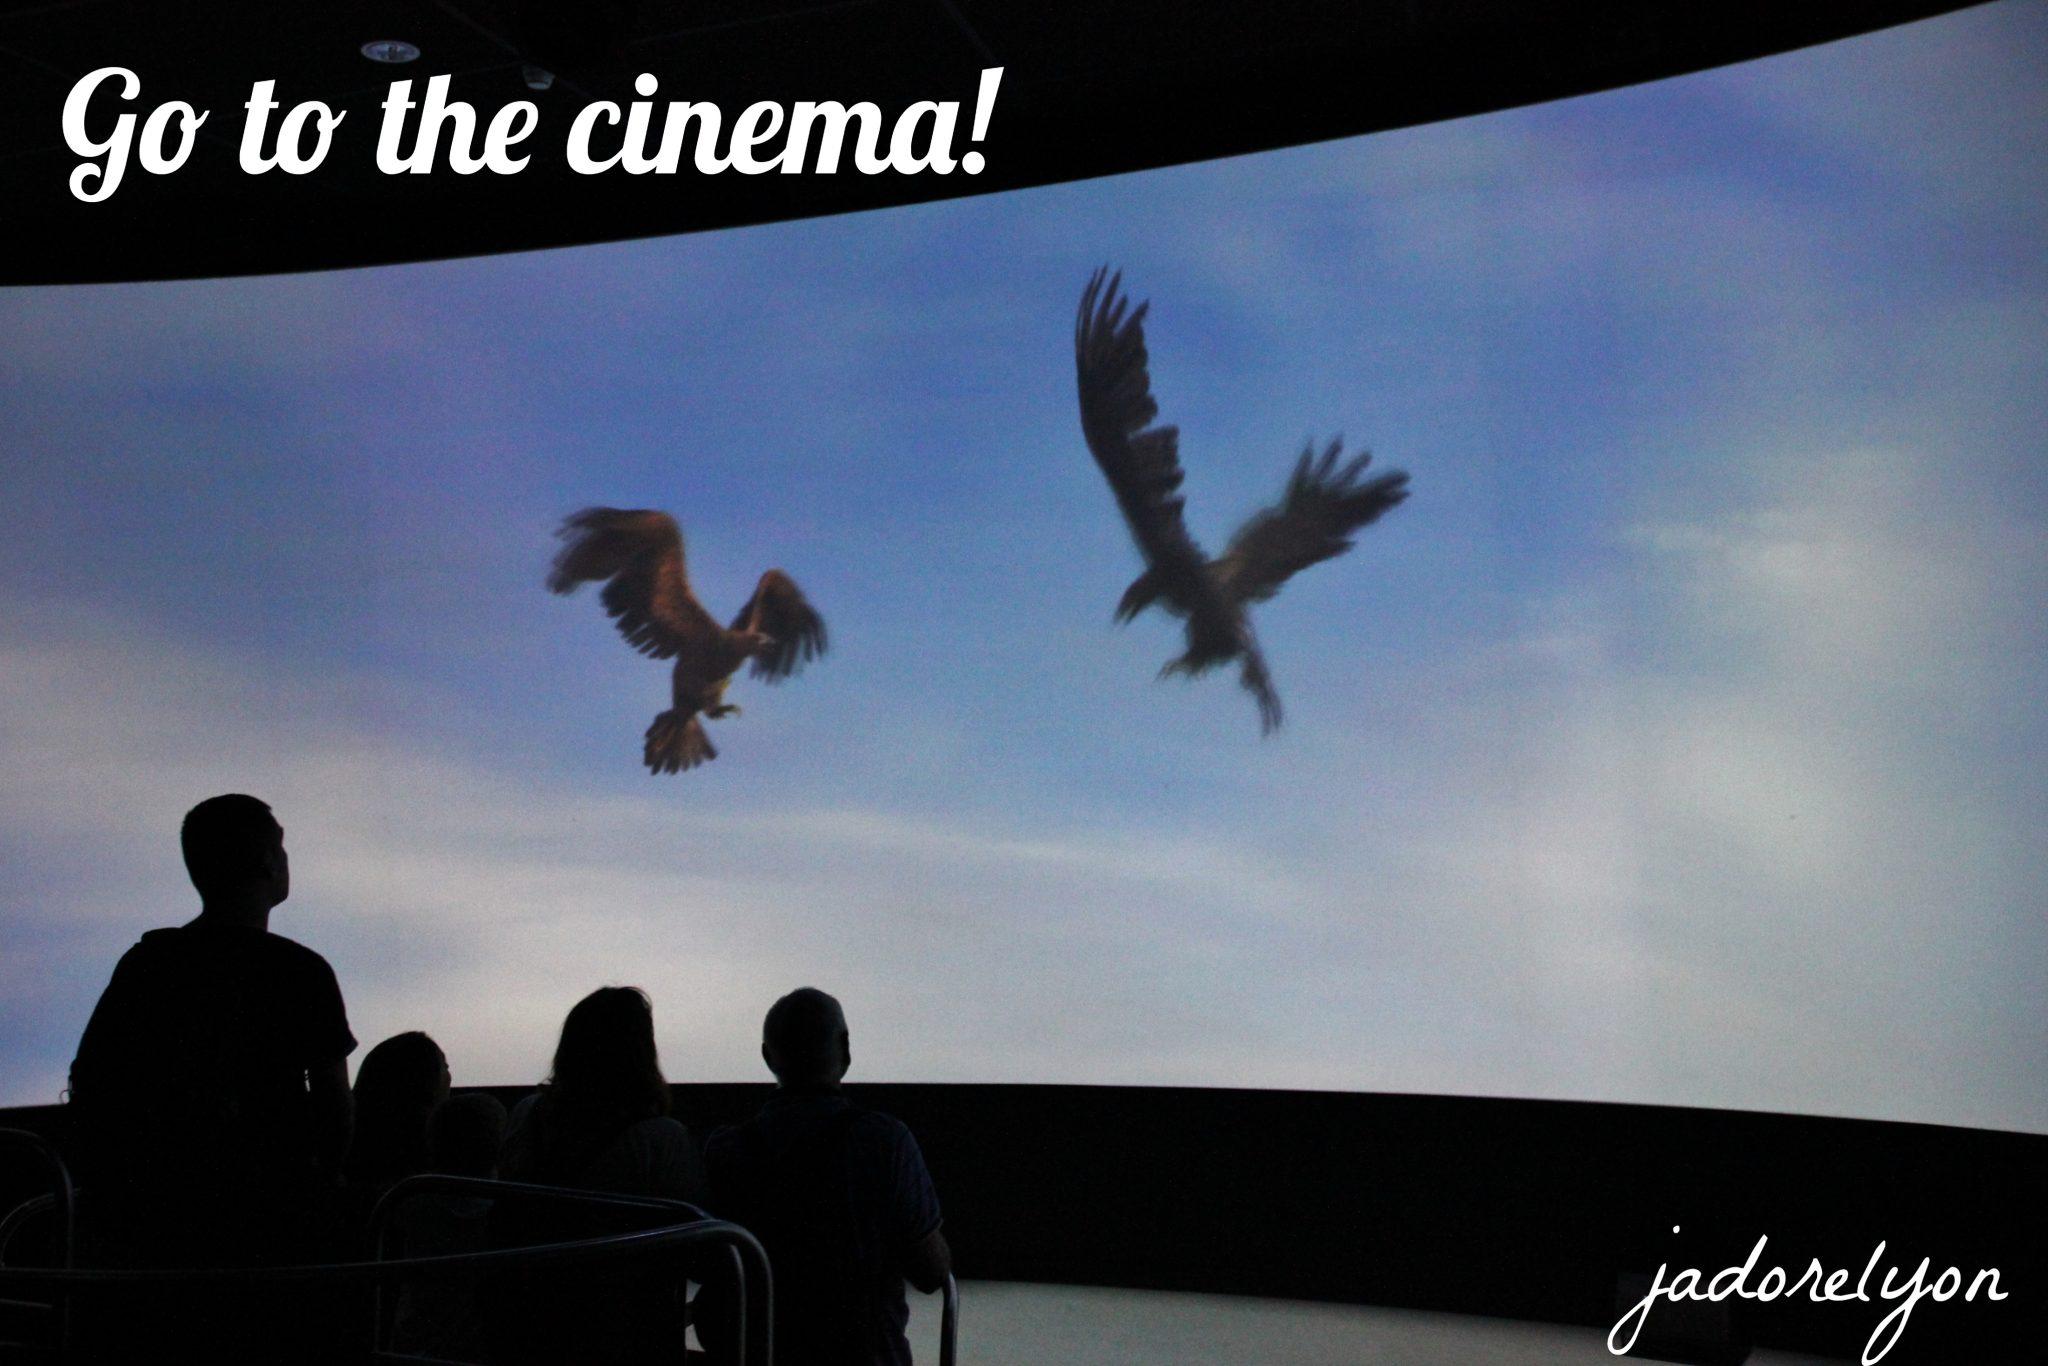 Go to the cinema!